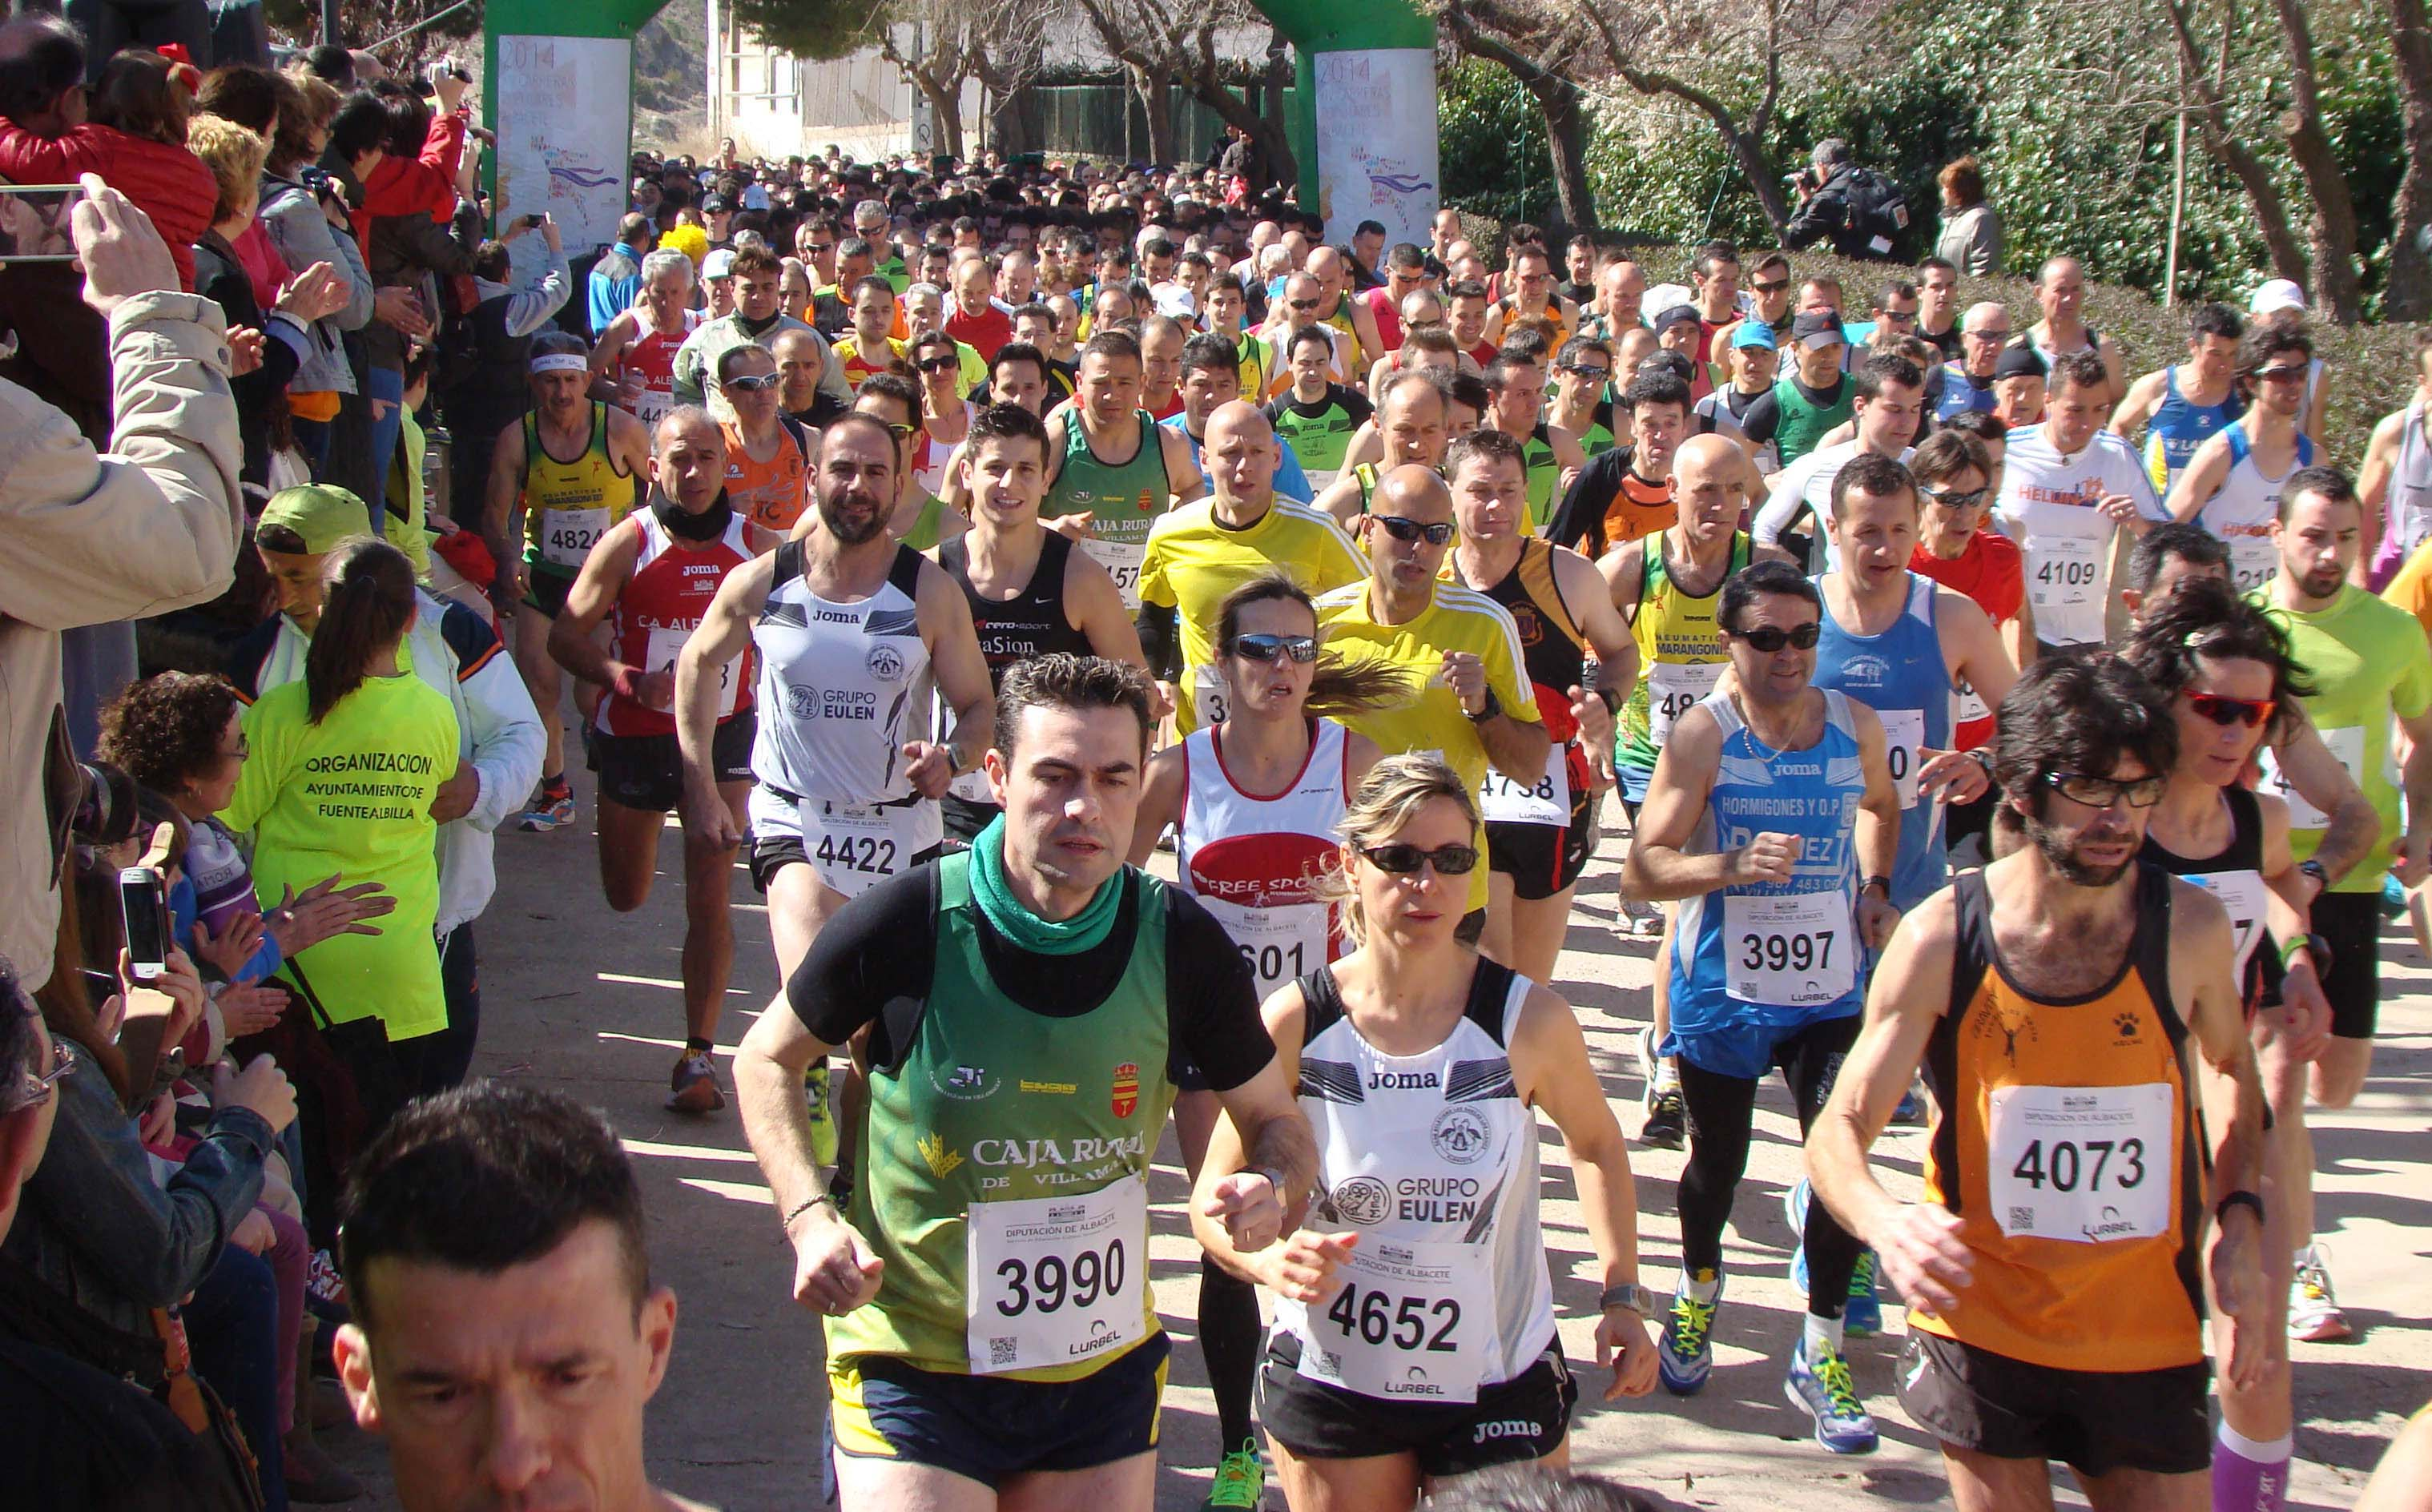 VI Carrera Popular de Fuentealbilla (Foto: Paco Villaescusa)